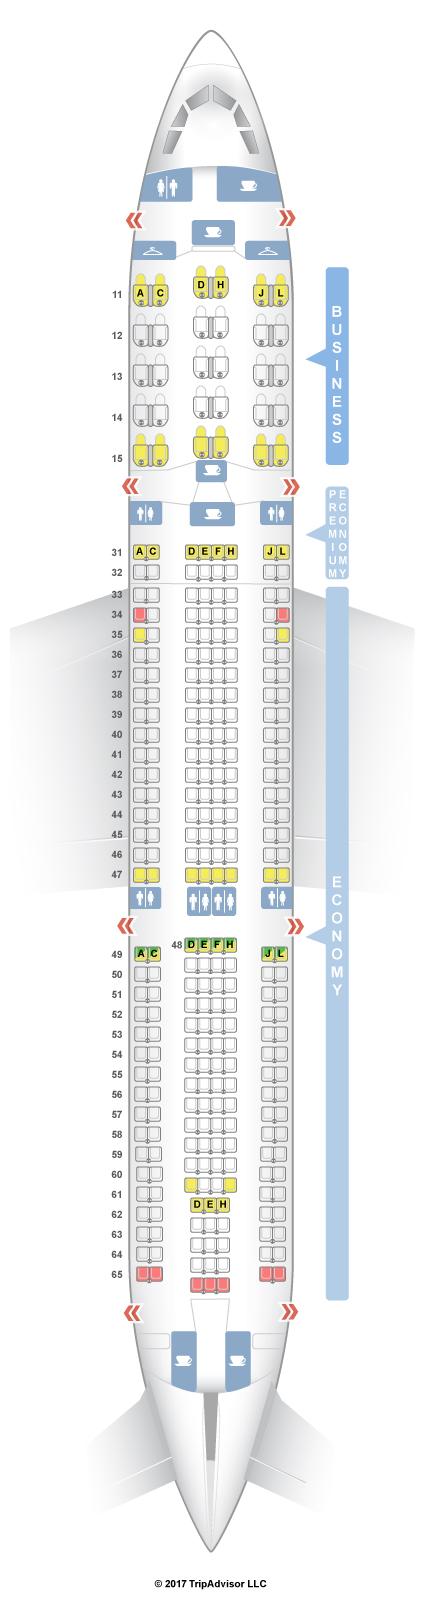 Air China Seat Map SeatGuru Seat Map Air China